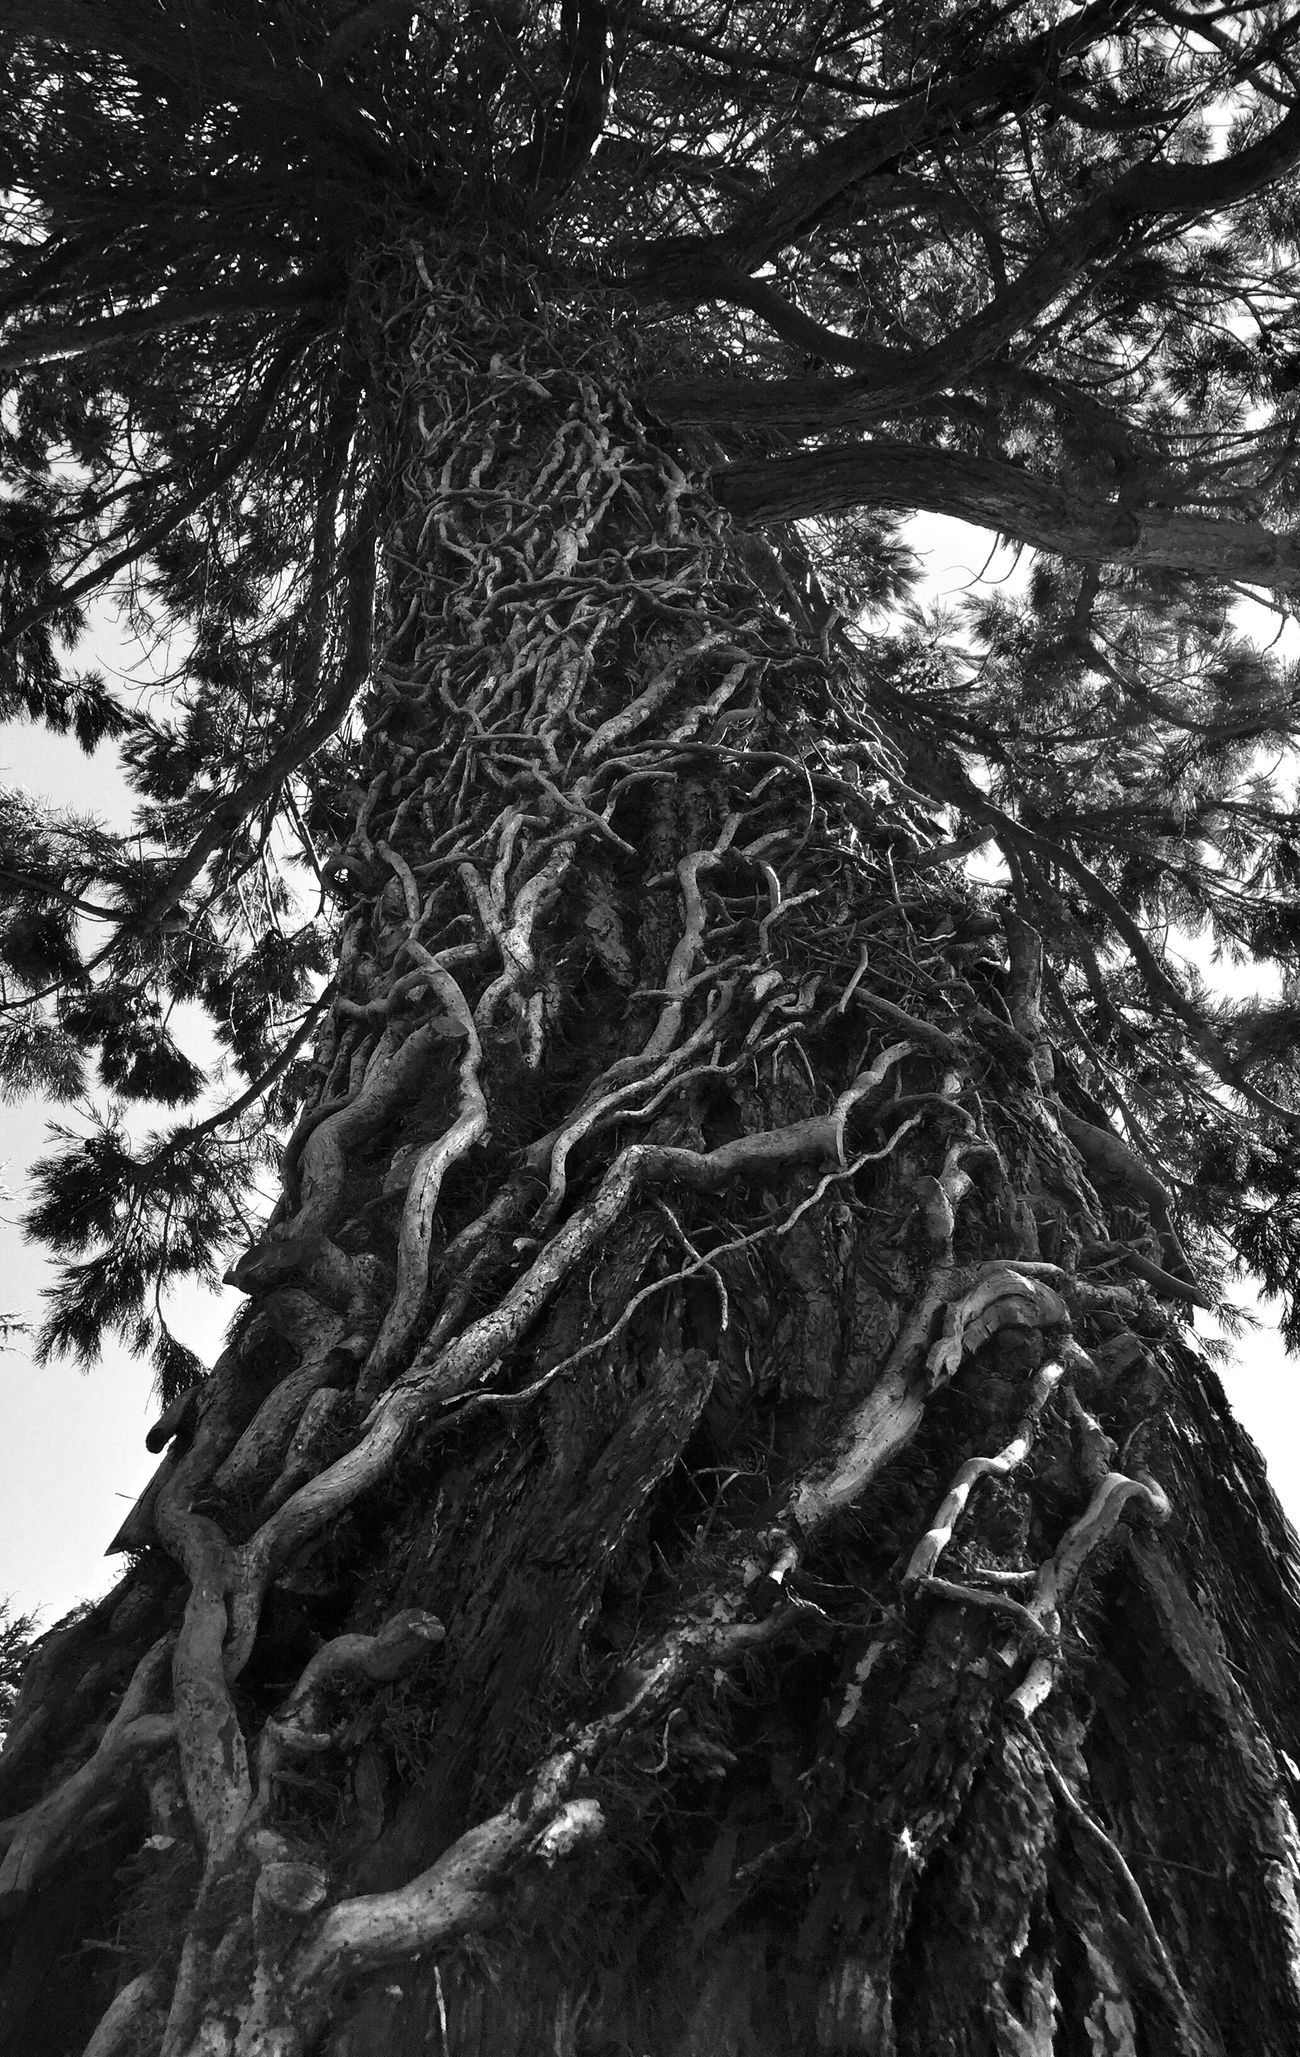 Trees TreePorn Monochrome Blackandwhite EyeEm Nature Lover Nature_collection Streamzoofamily Traveling